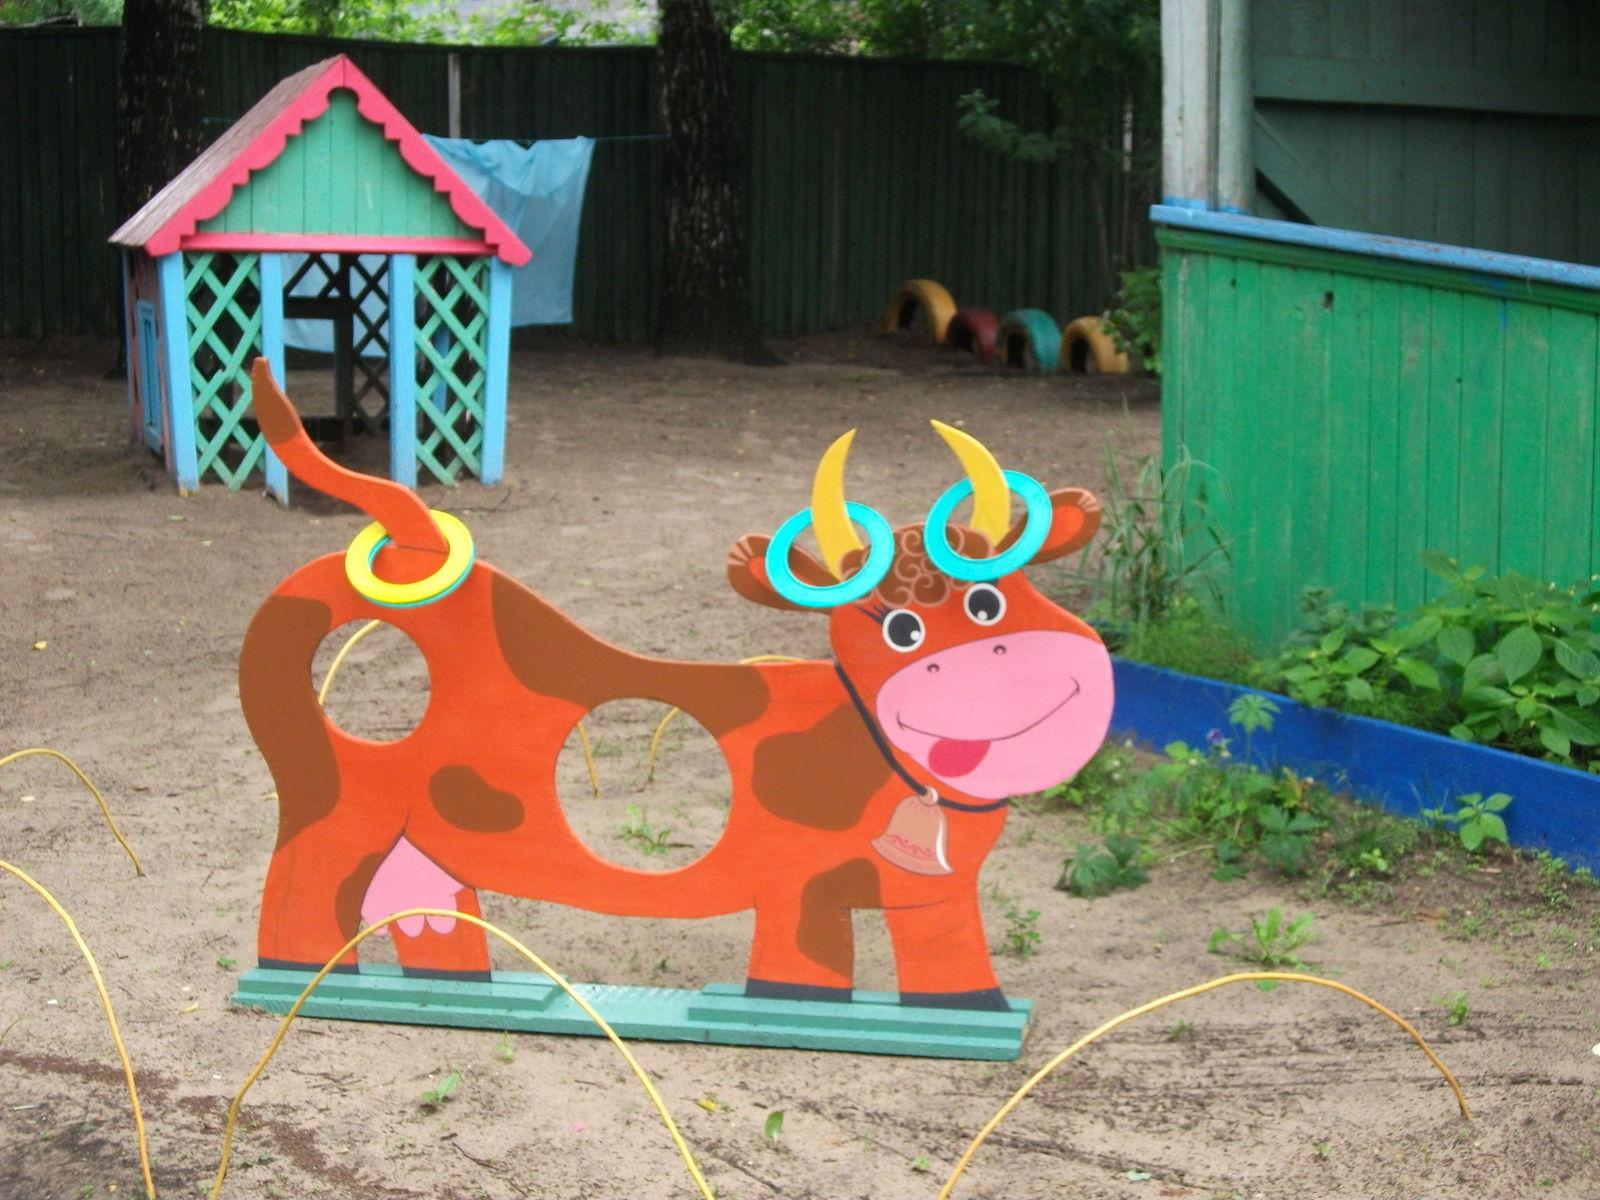 Картинки поделок на участке детского сада своими руками